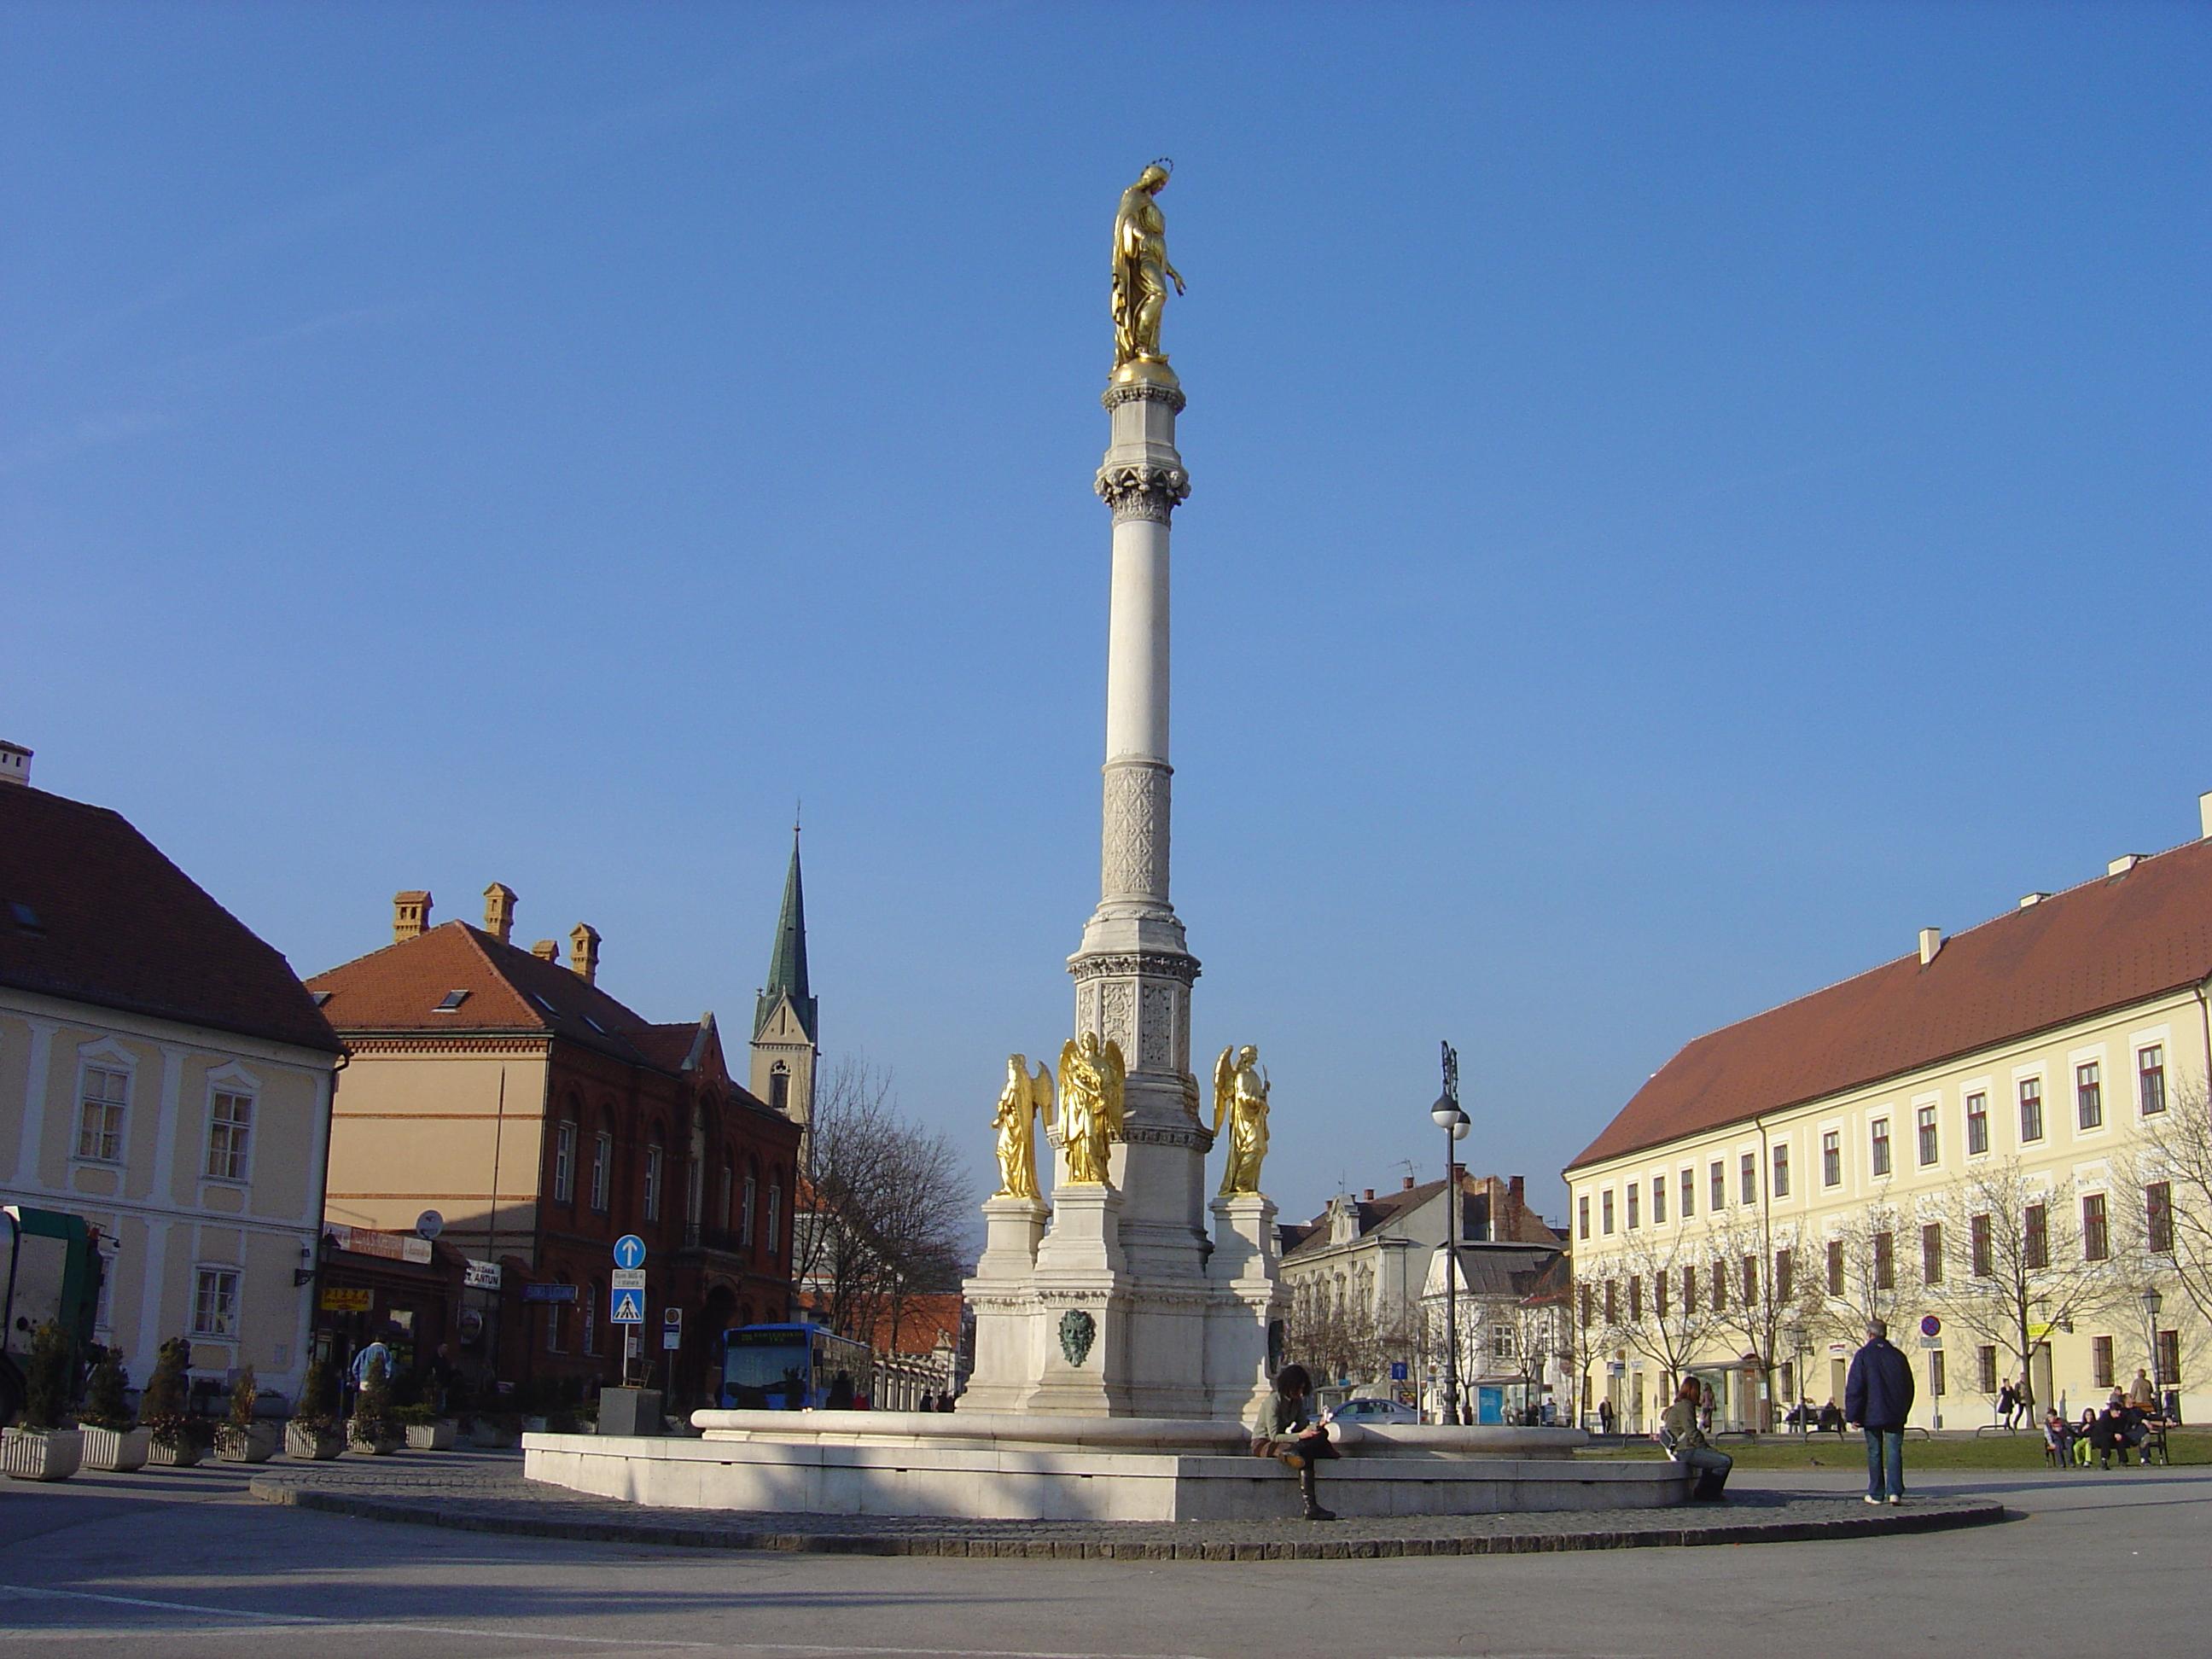 Zagreb Croatia  city photos gallery : Description Zagreb Kaptol Square